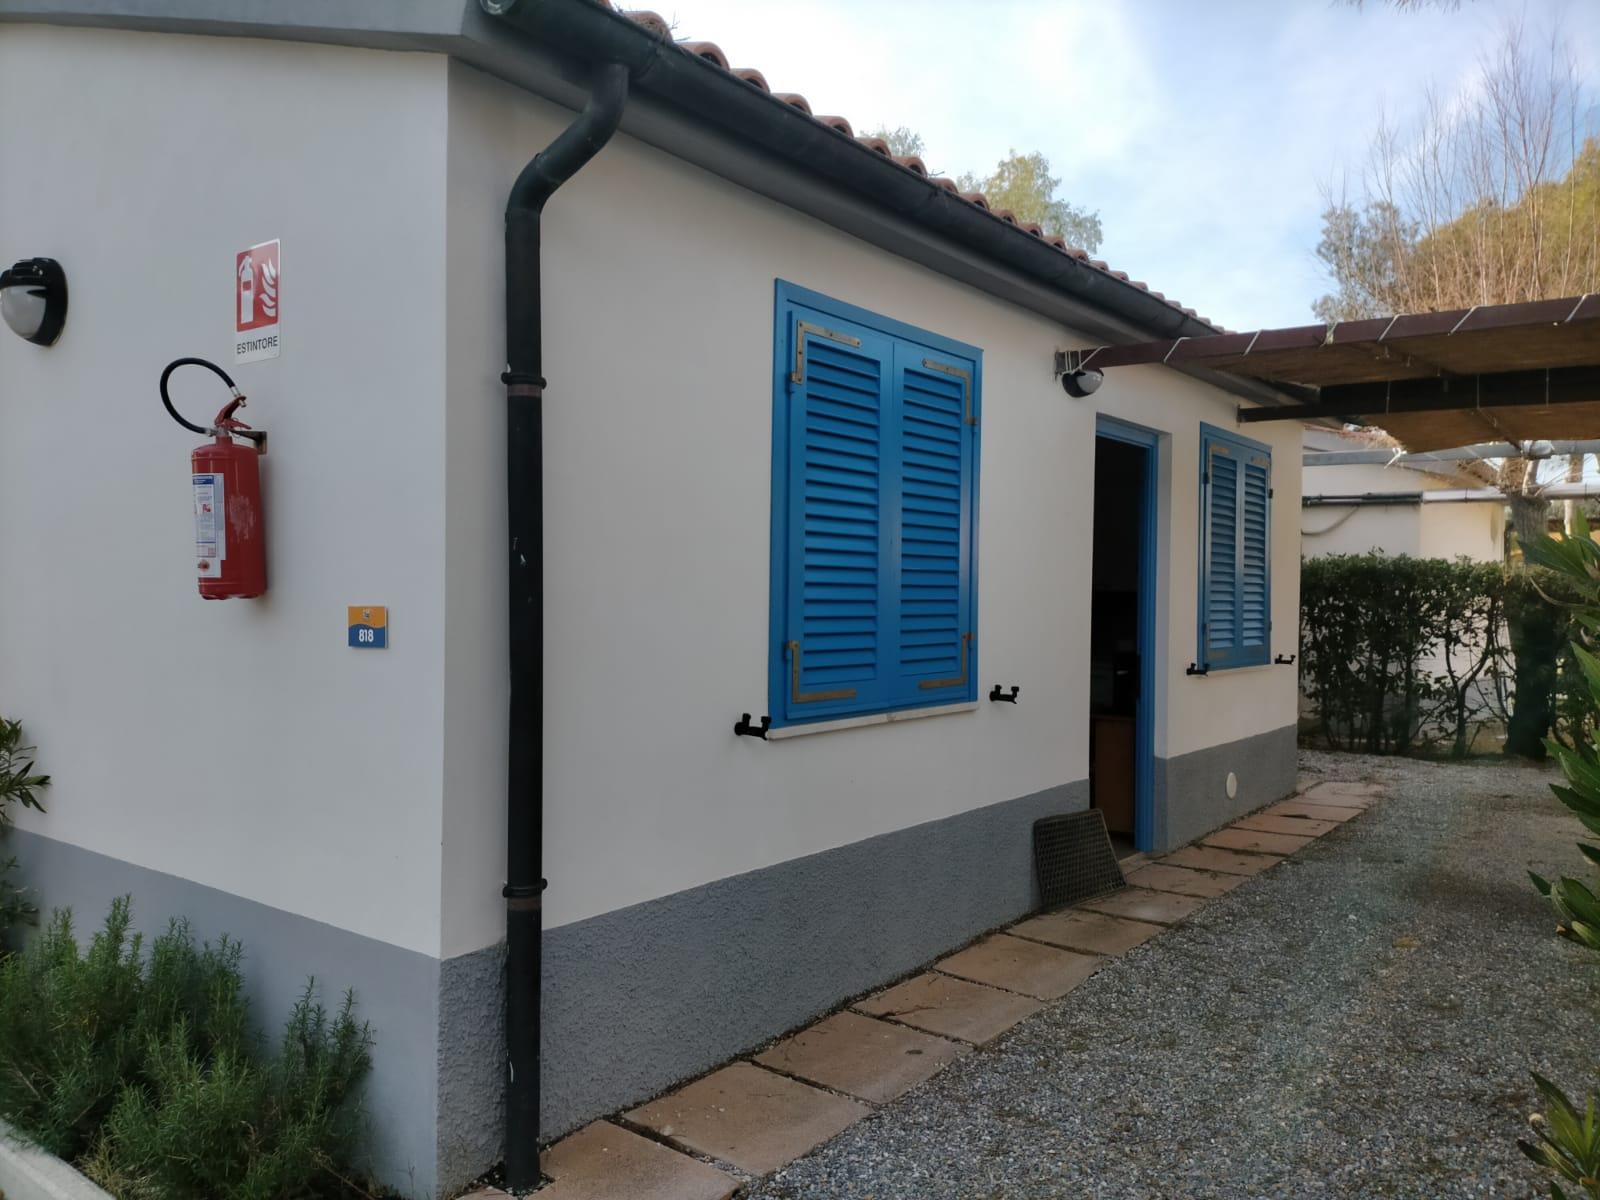 Bungalow in muratura Toscana mare